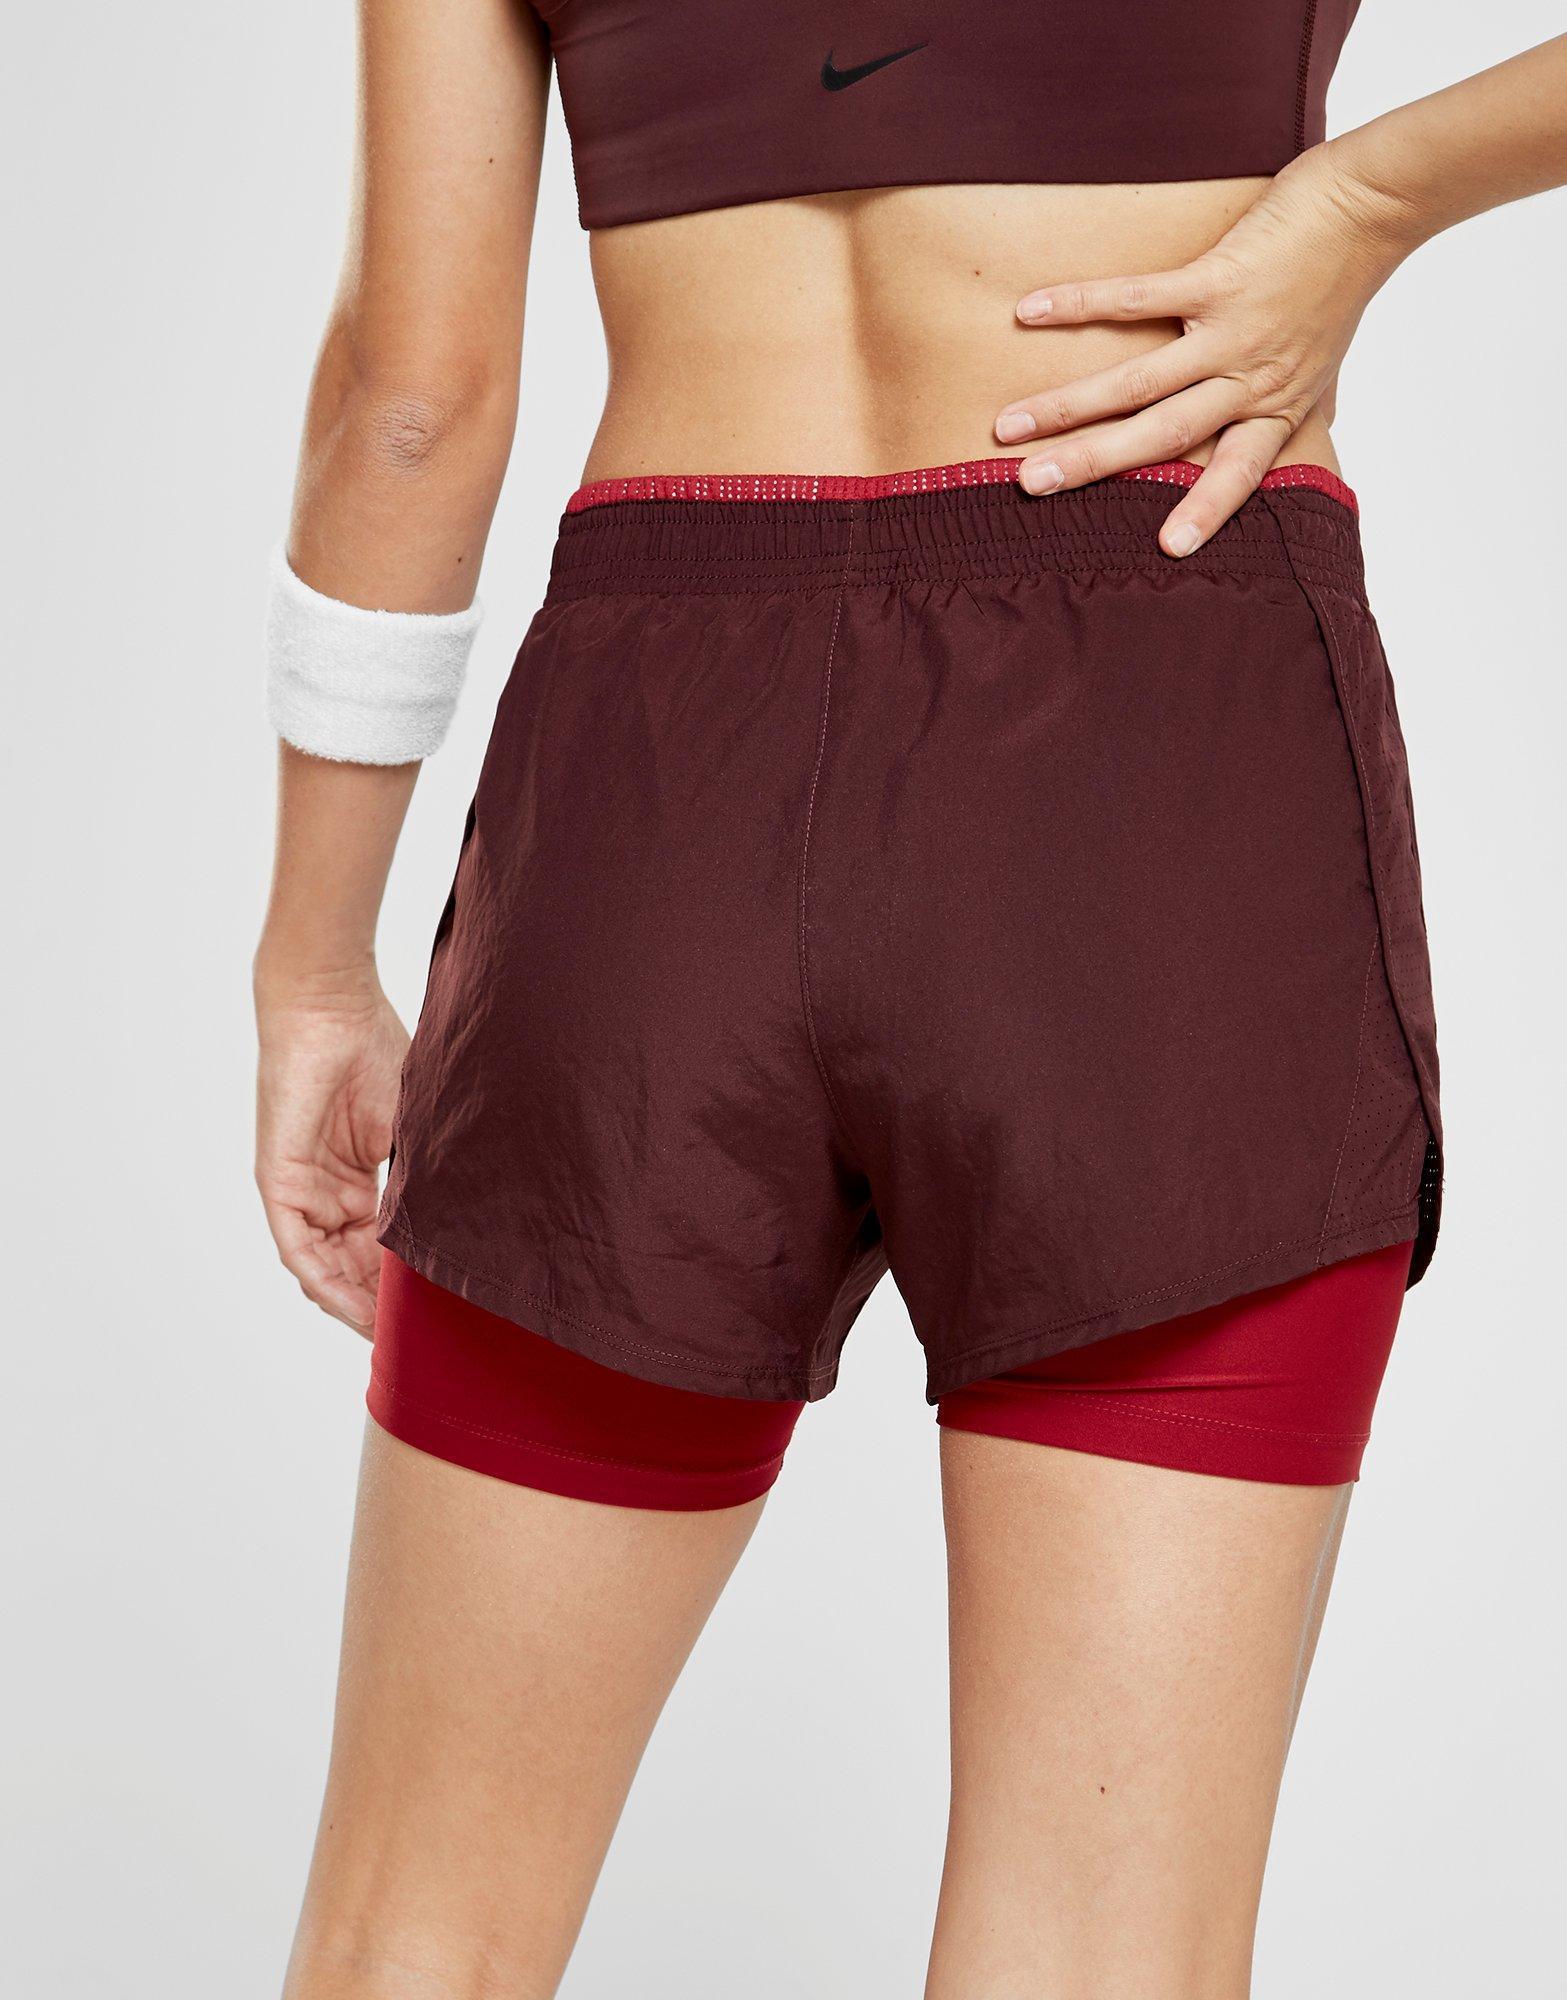 f1126117b2f Lyst - Nike Running 10k 2 In 1 Shorts in Red